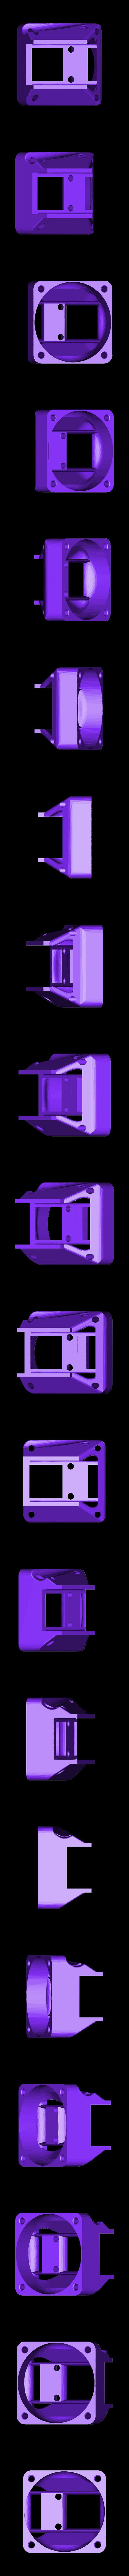 microswiss_fan_shroud_edited.stl Download free STL file Microswiss Fan Shroud Light Version! • 3D printable design, JeenyusPete